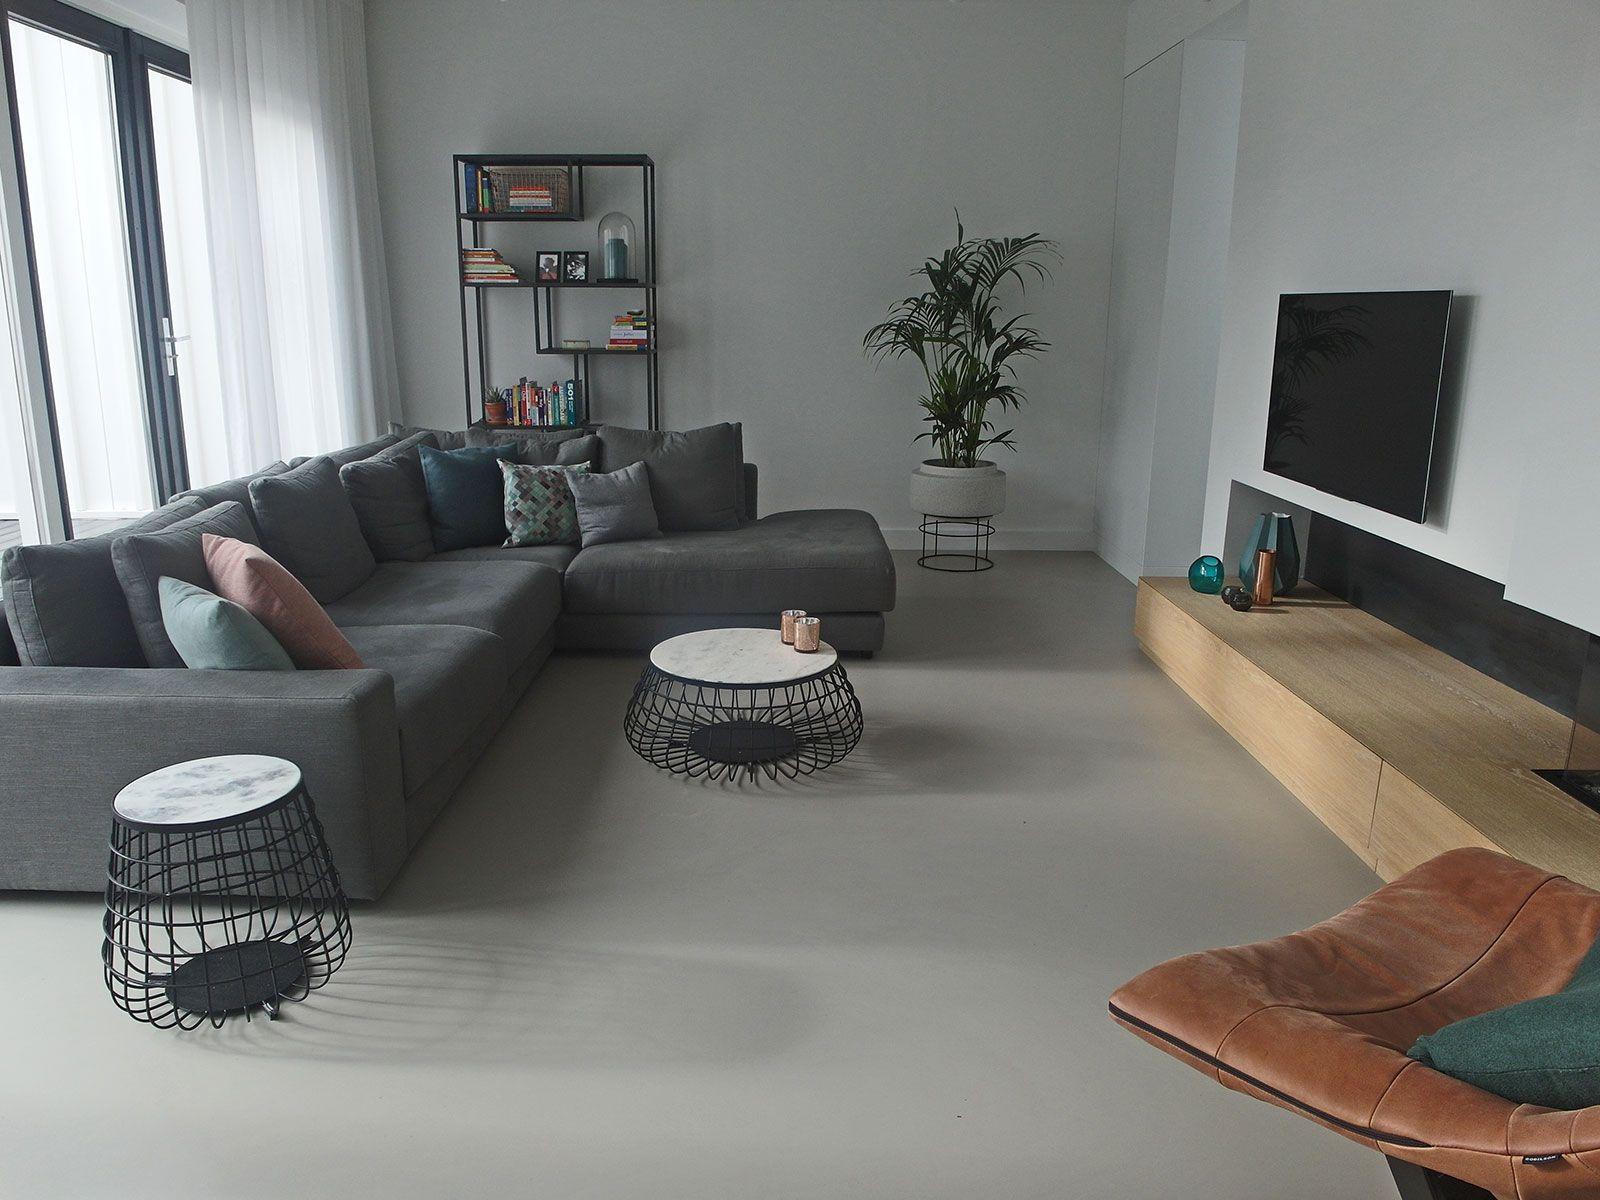 Gietvloer woonkamer amsterdam vloeren pinterest Grijze woonkamer